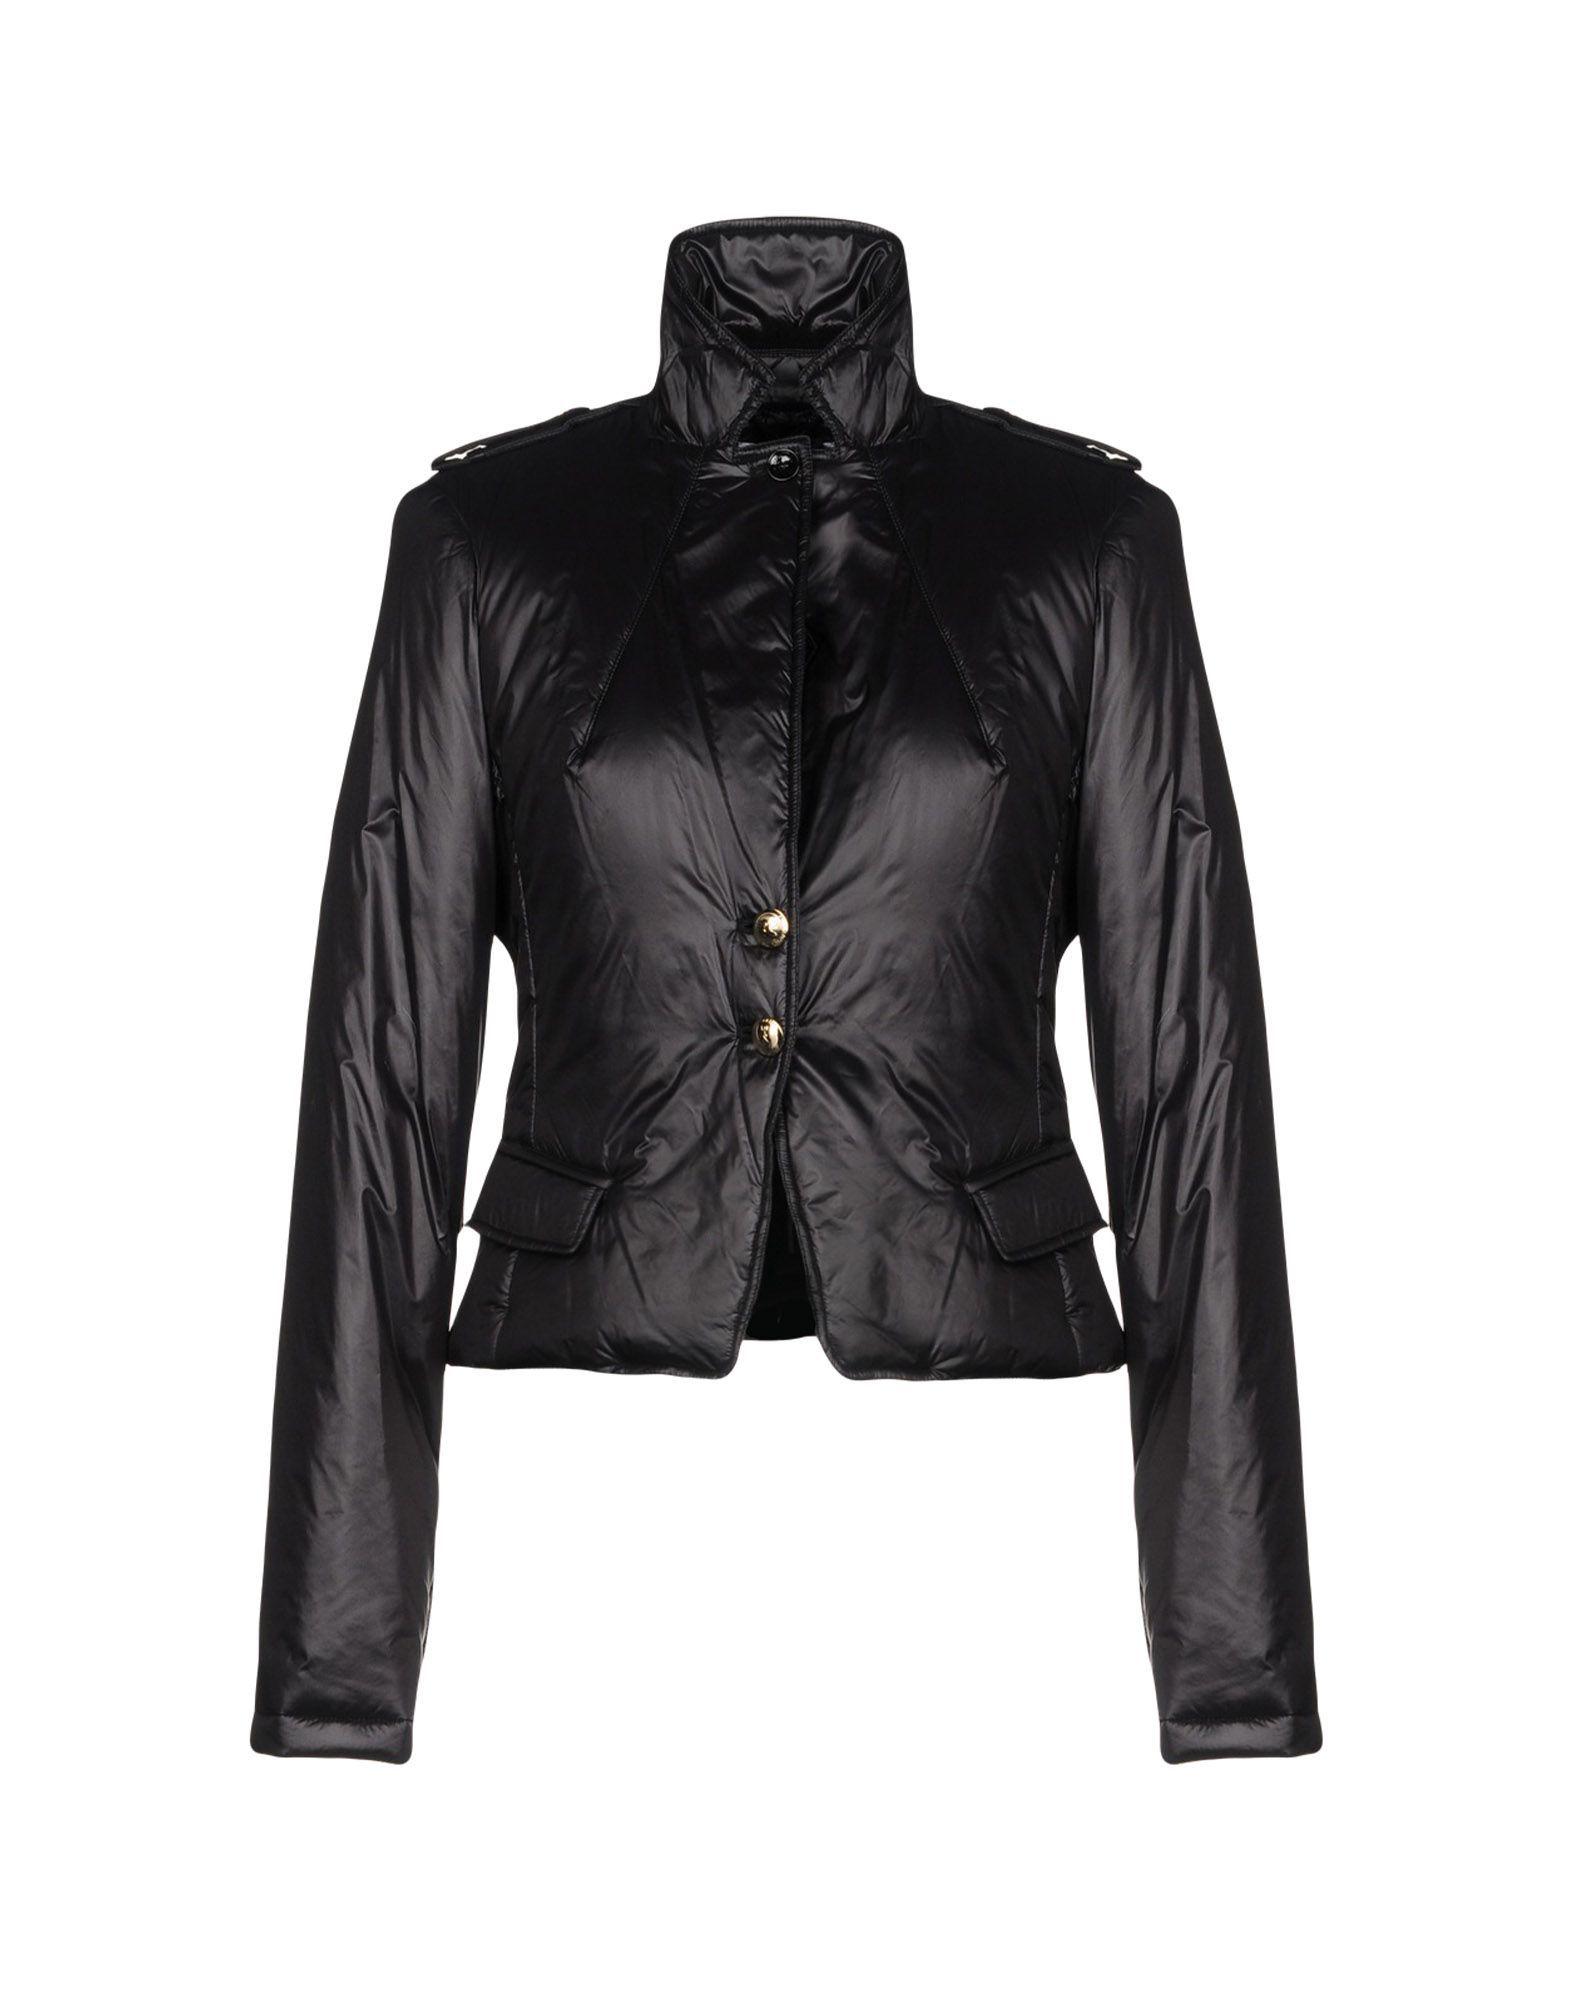 Patrizia Pepe Black Techno Fabric Jacket